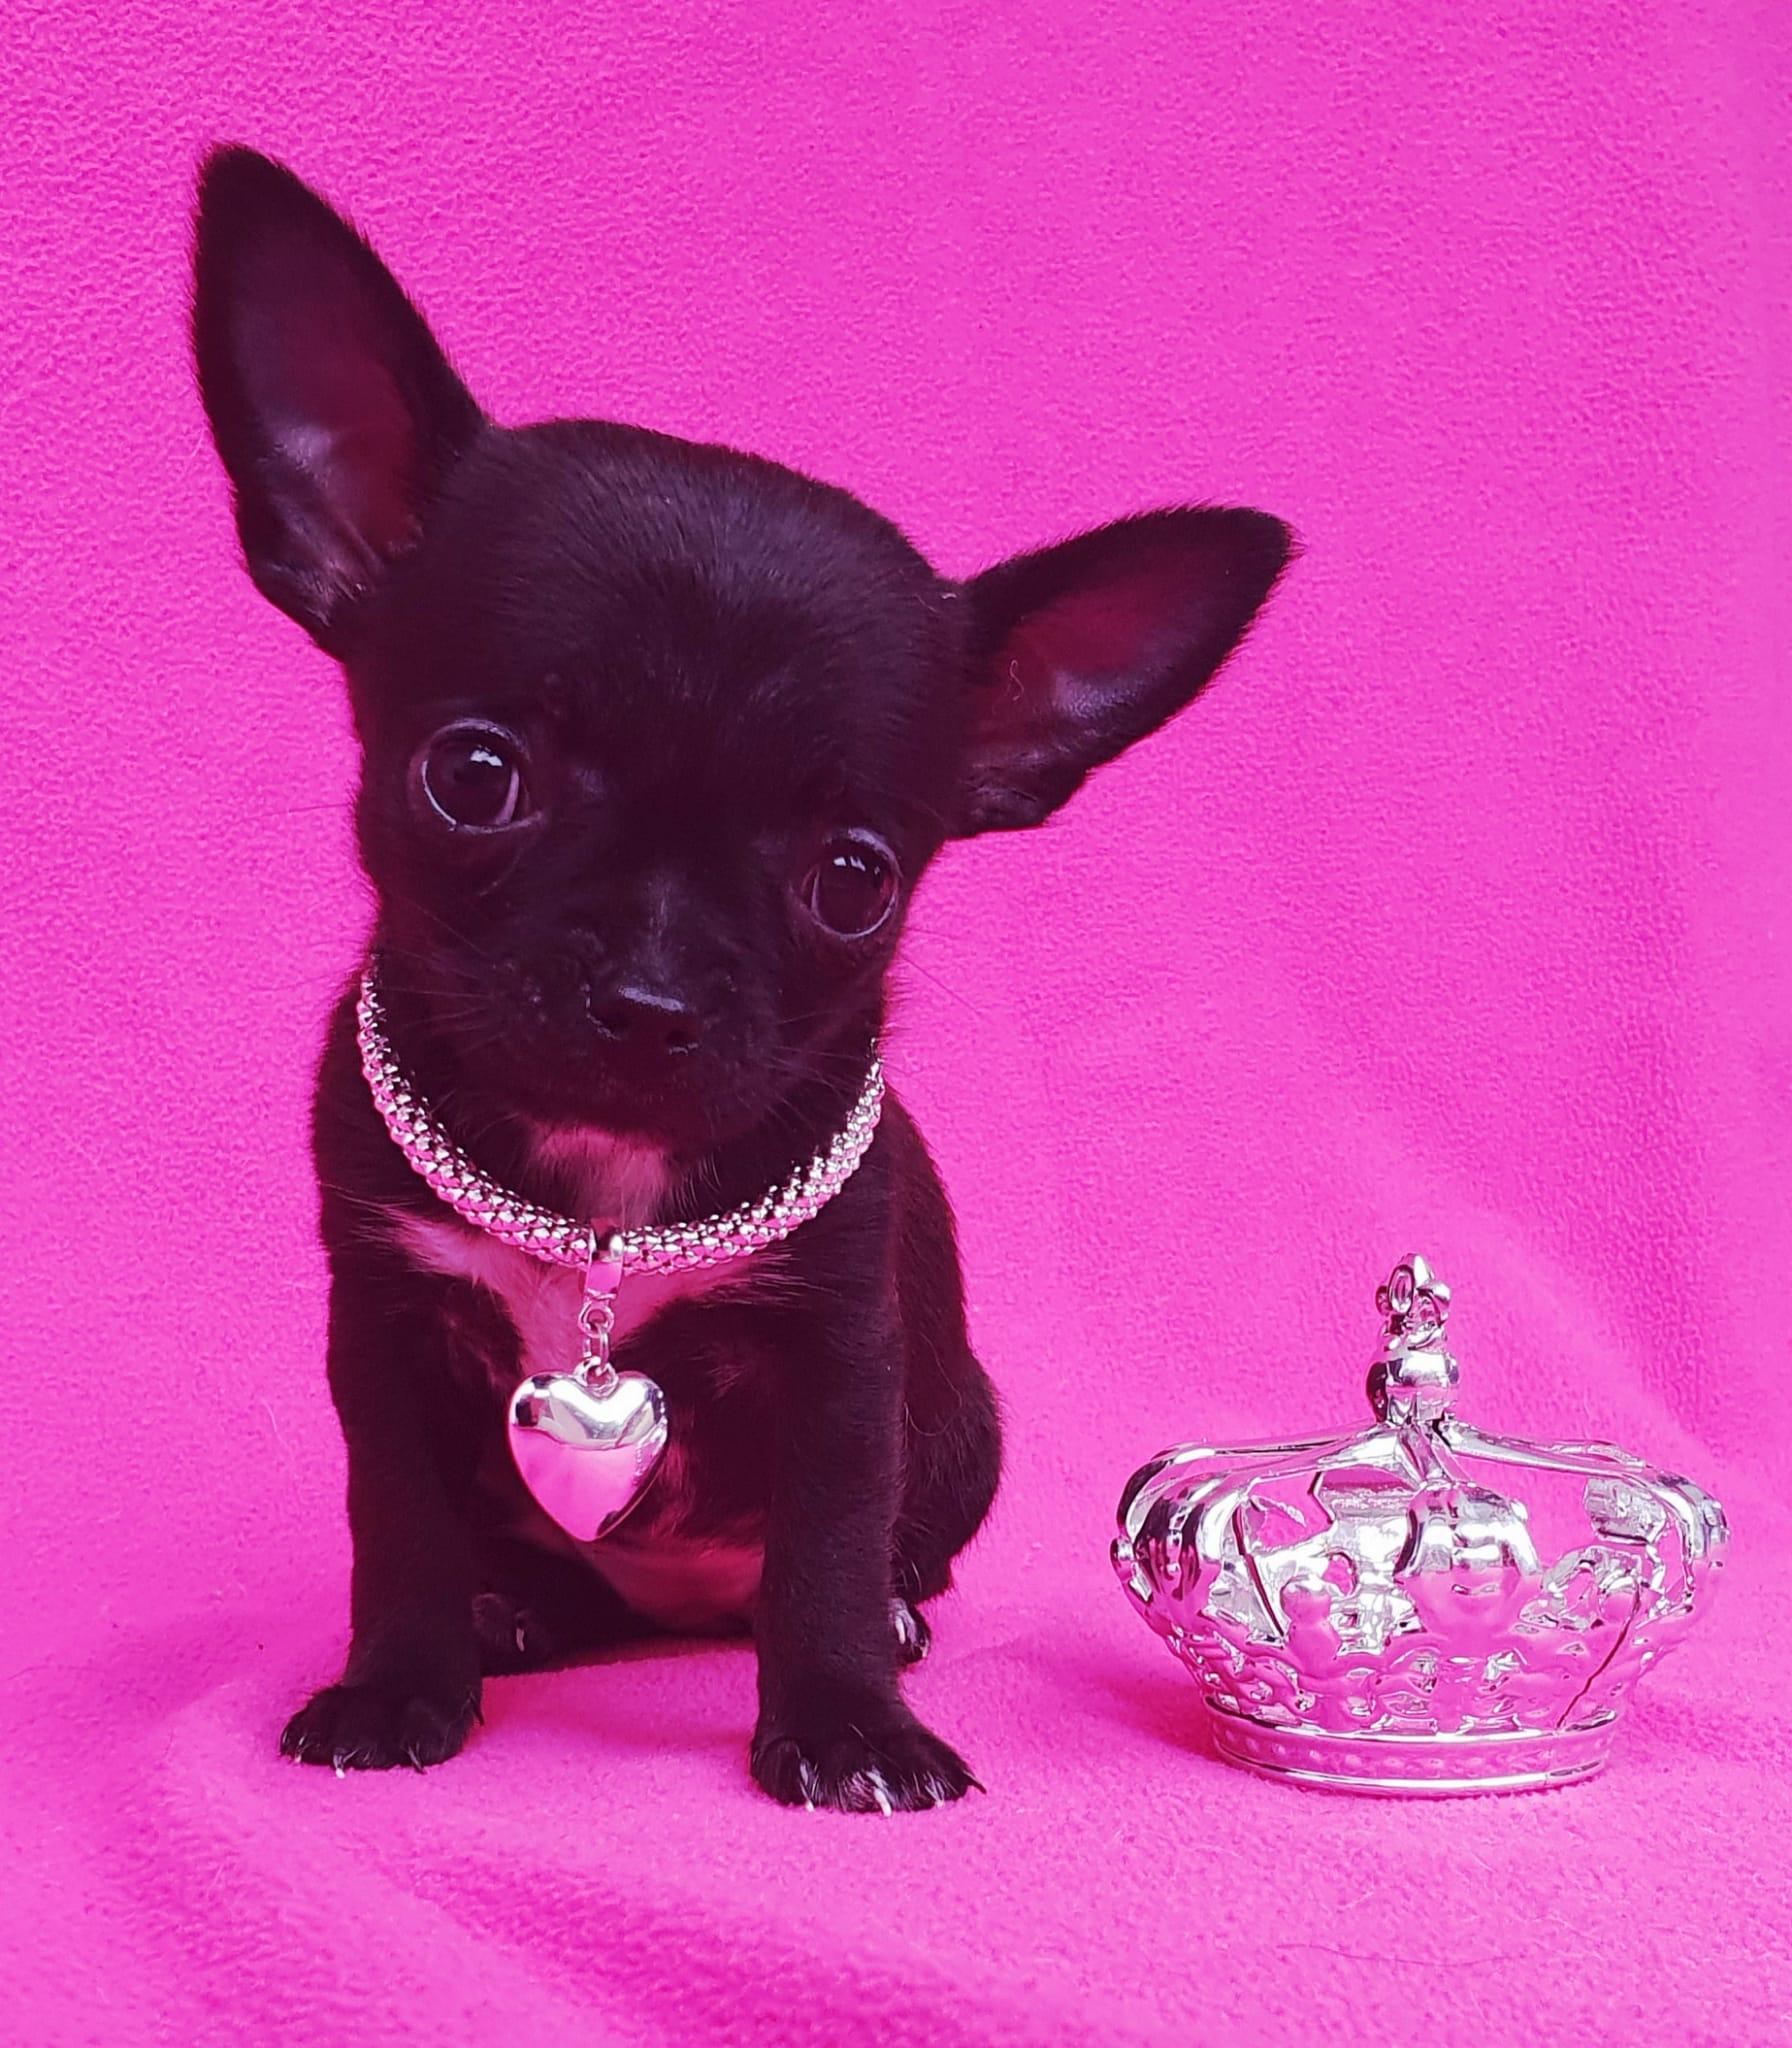 1. Platz Yuna of Glamour